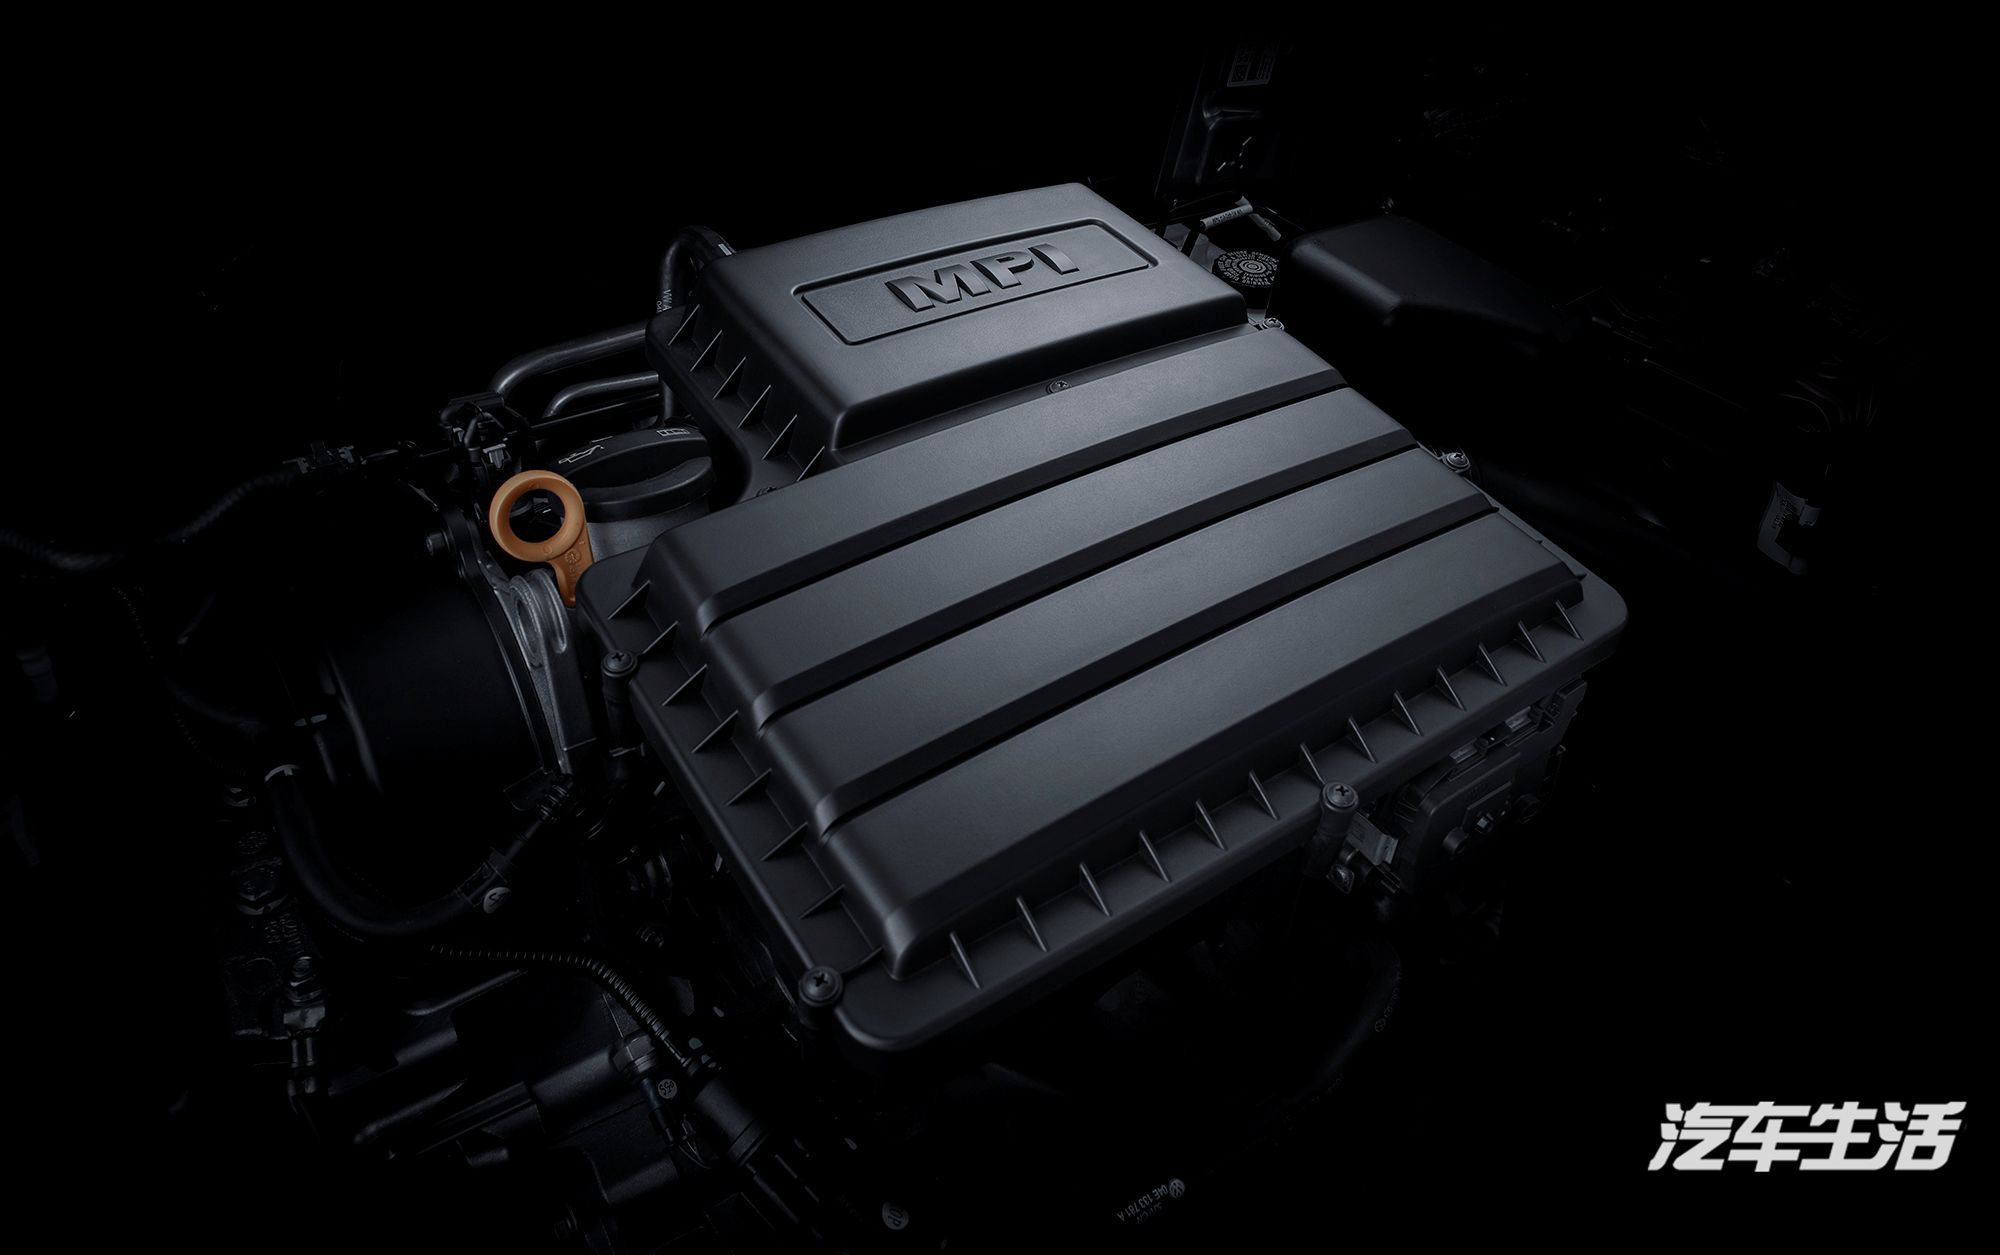 6l自然吸气发动机,提供性能相同,燃油经济性更出色的1.